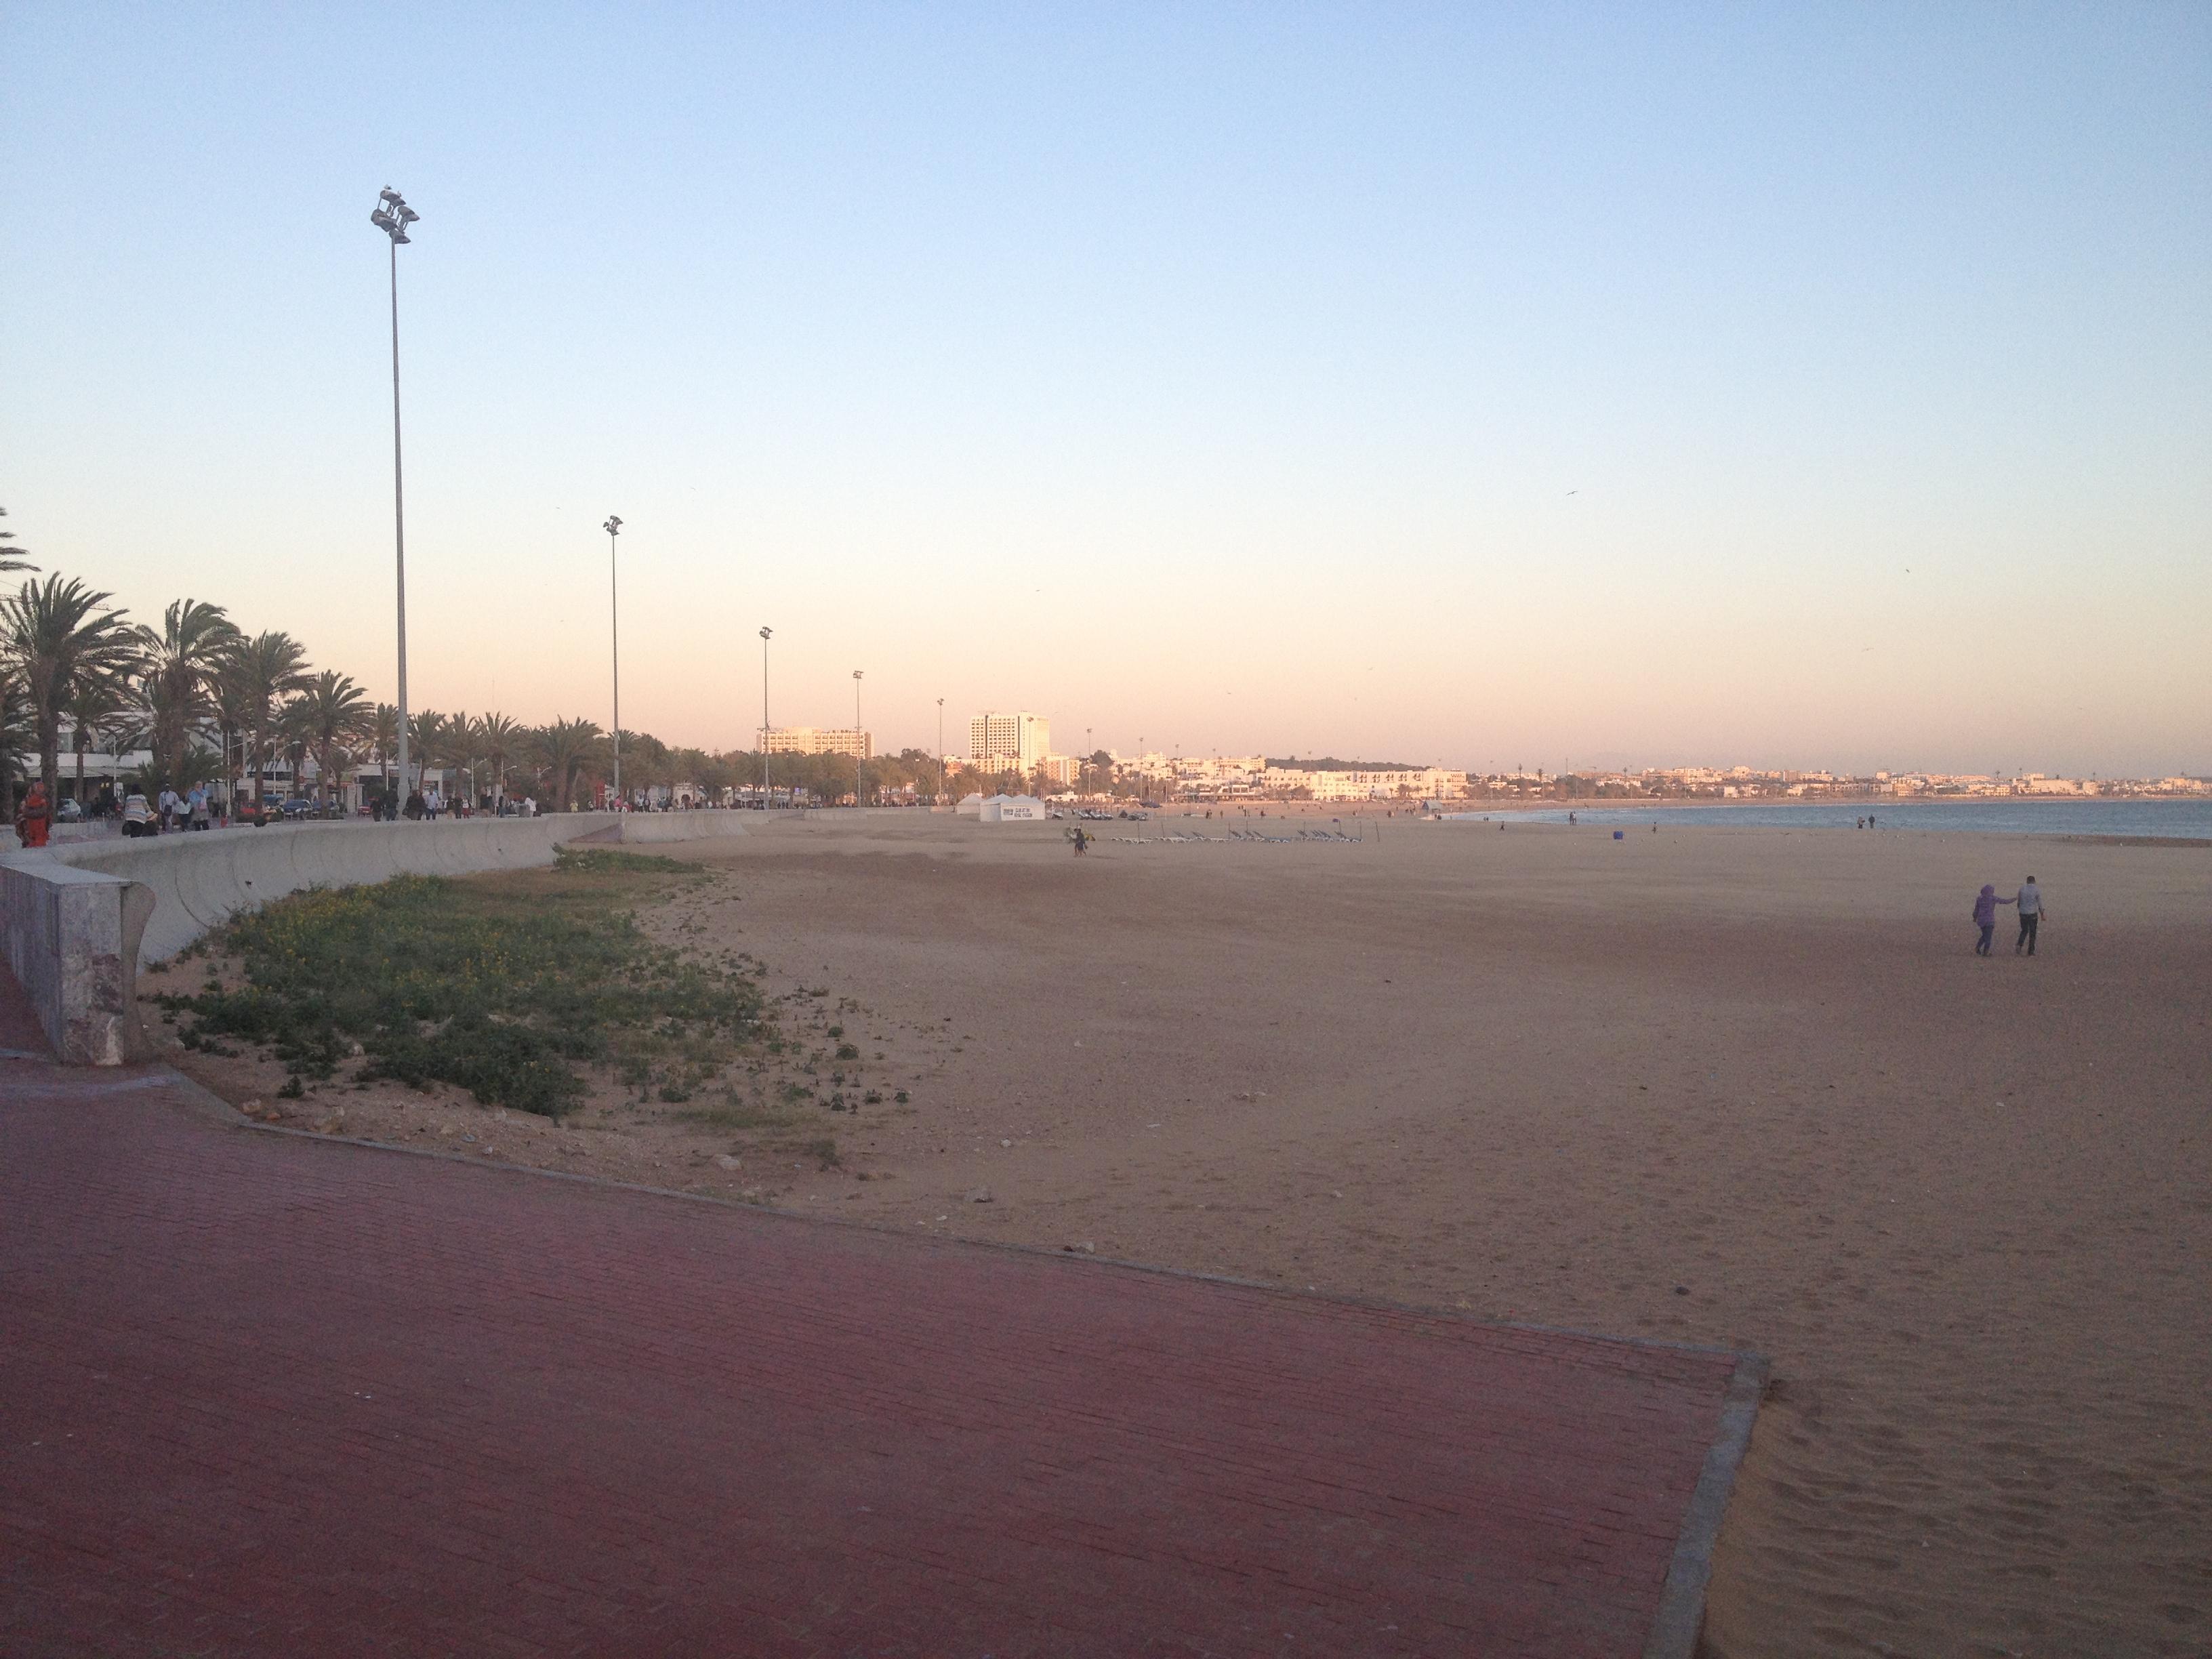 Agadir bay, a very broad sand beach bordered by a long concrete boardwalk